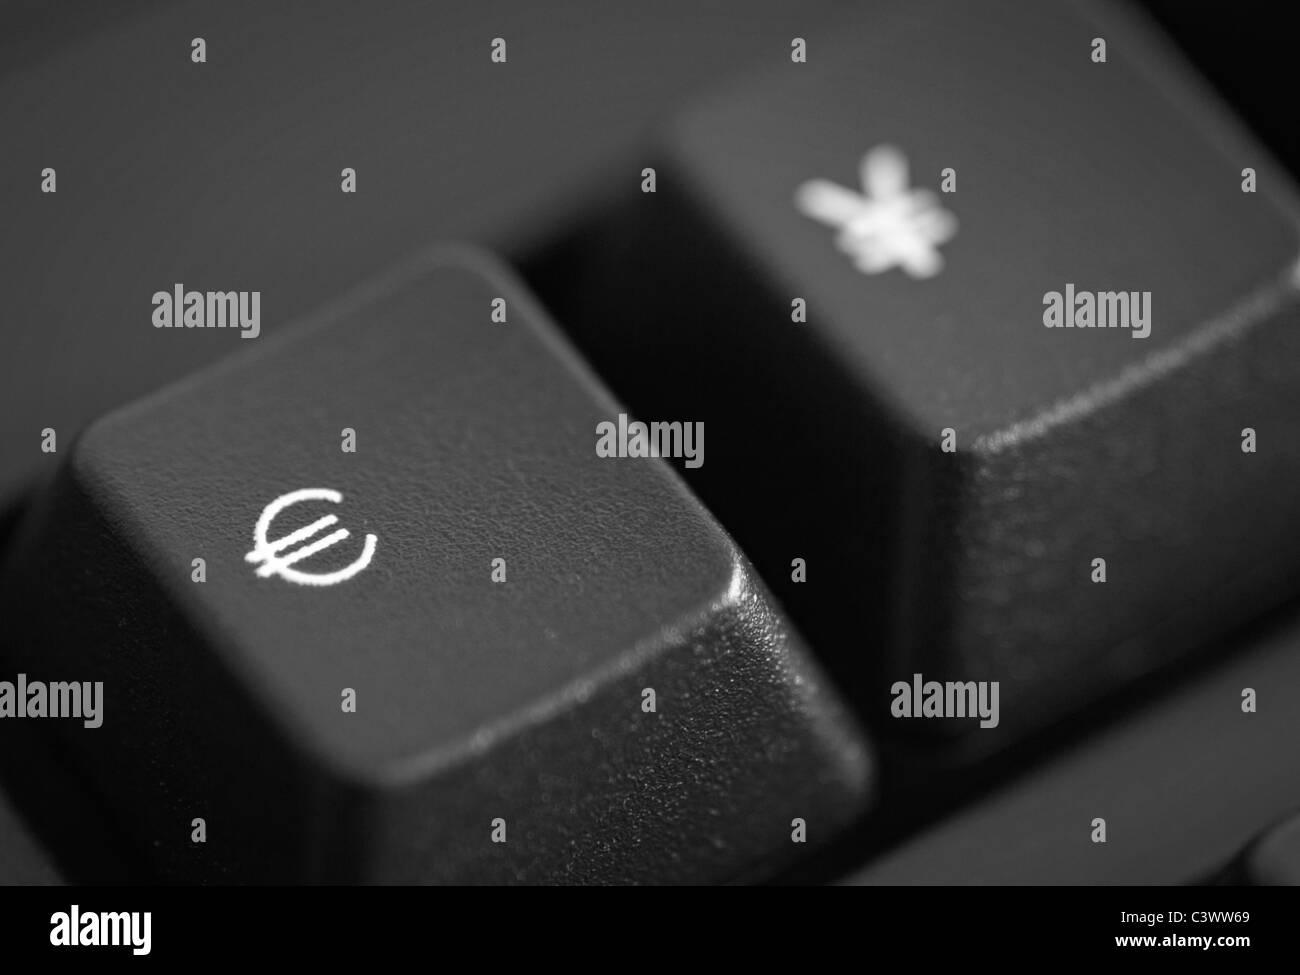 close up of a Euro Symbol and Yen Symbol keys - Stock Image